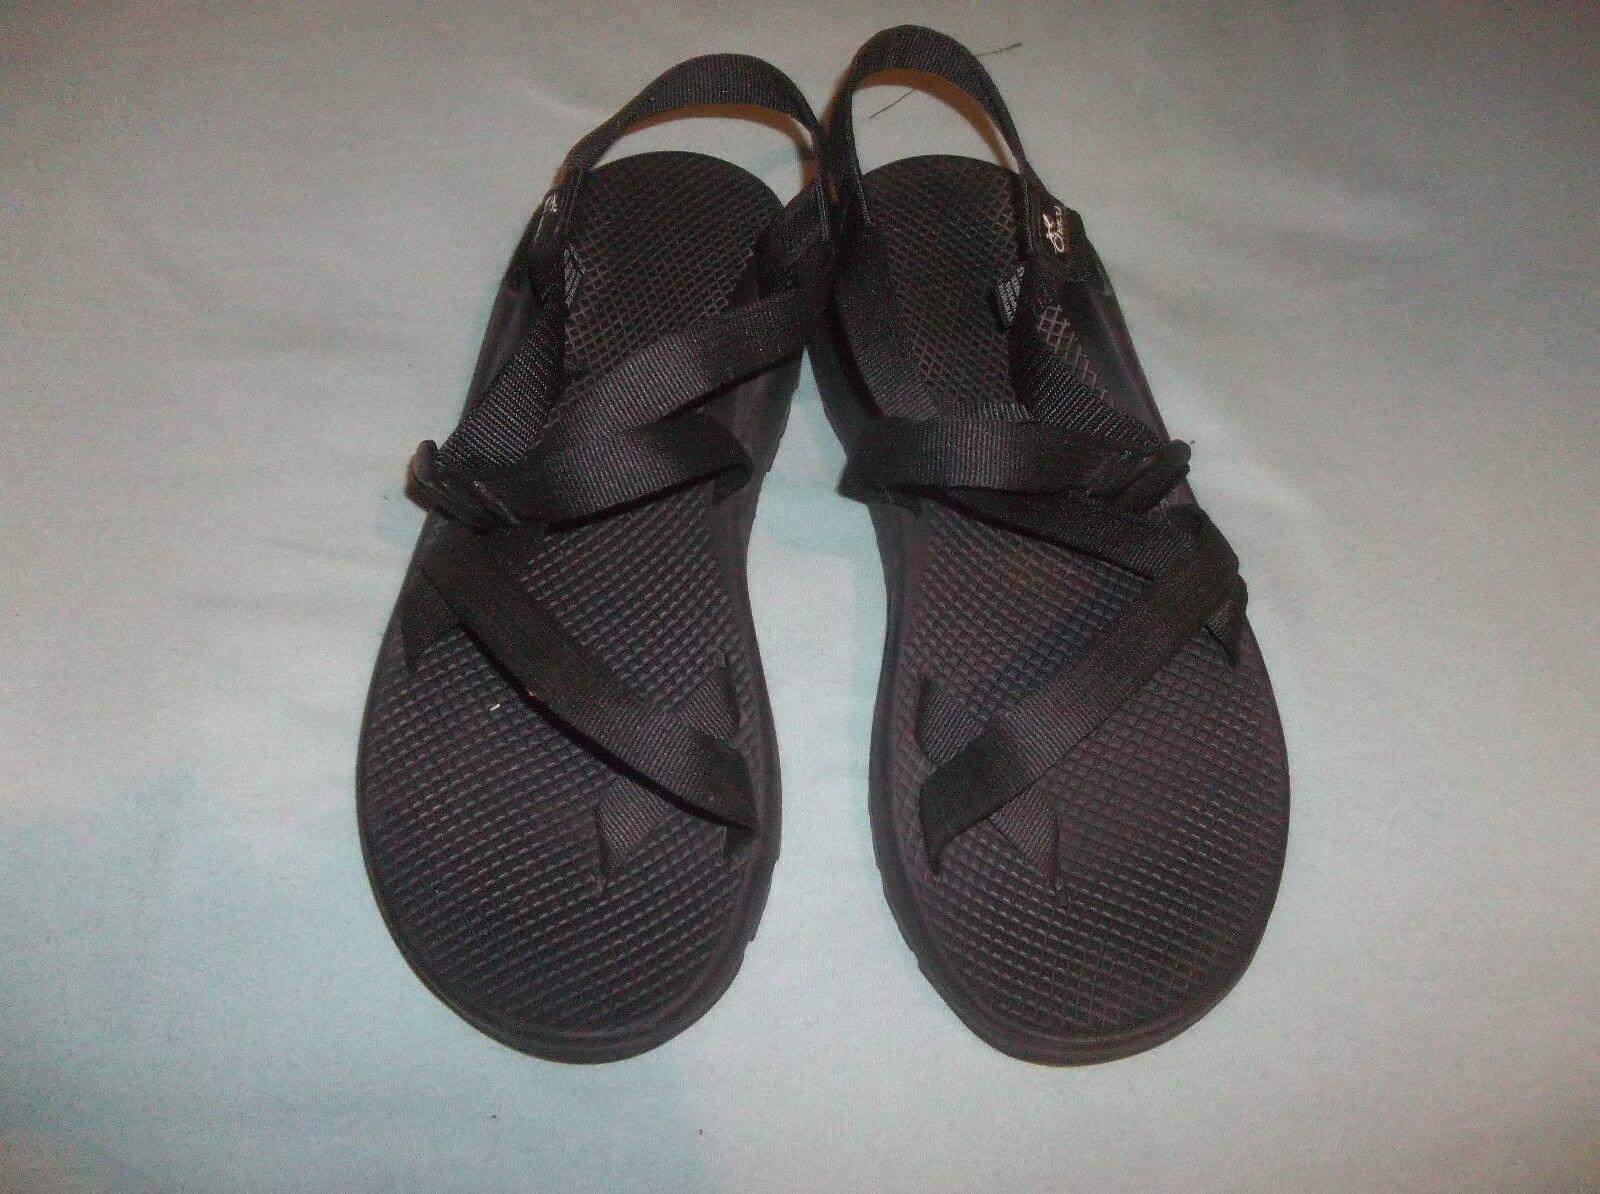 Chaco Sandals Original Toe Strap River Rafting Hiking Vibram Lug Sole USA Black